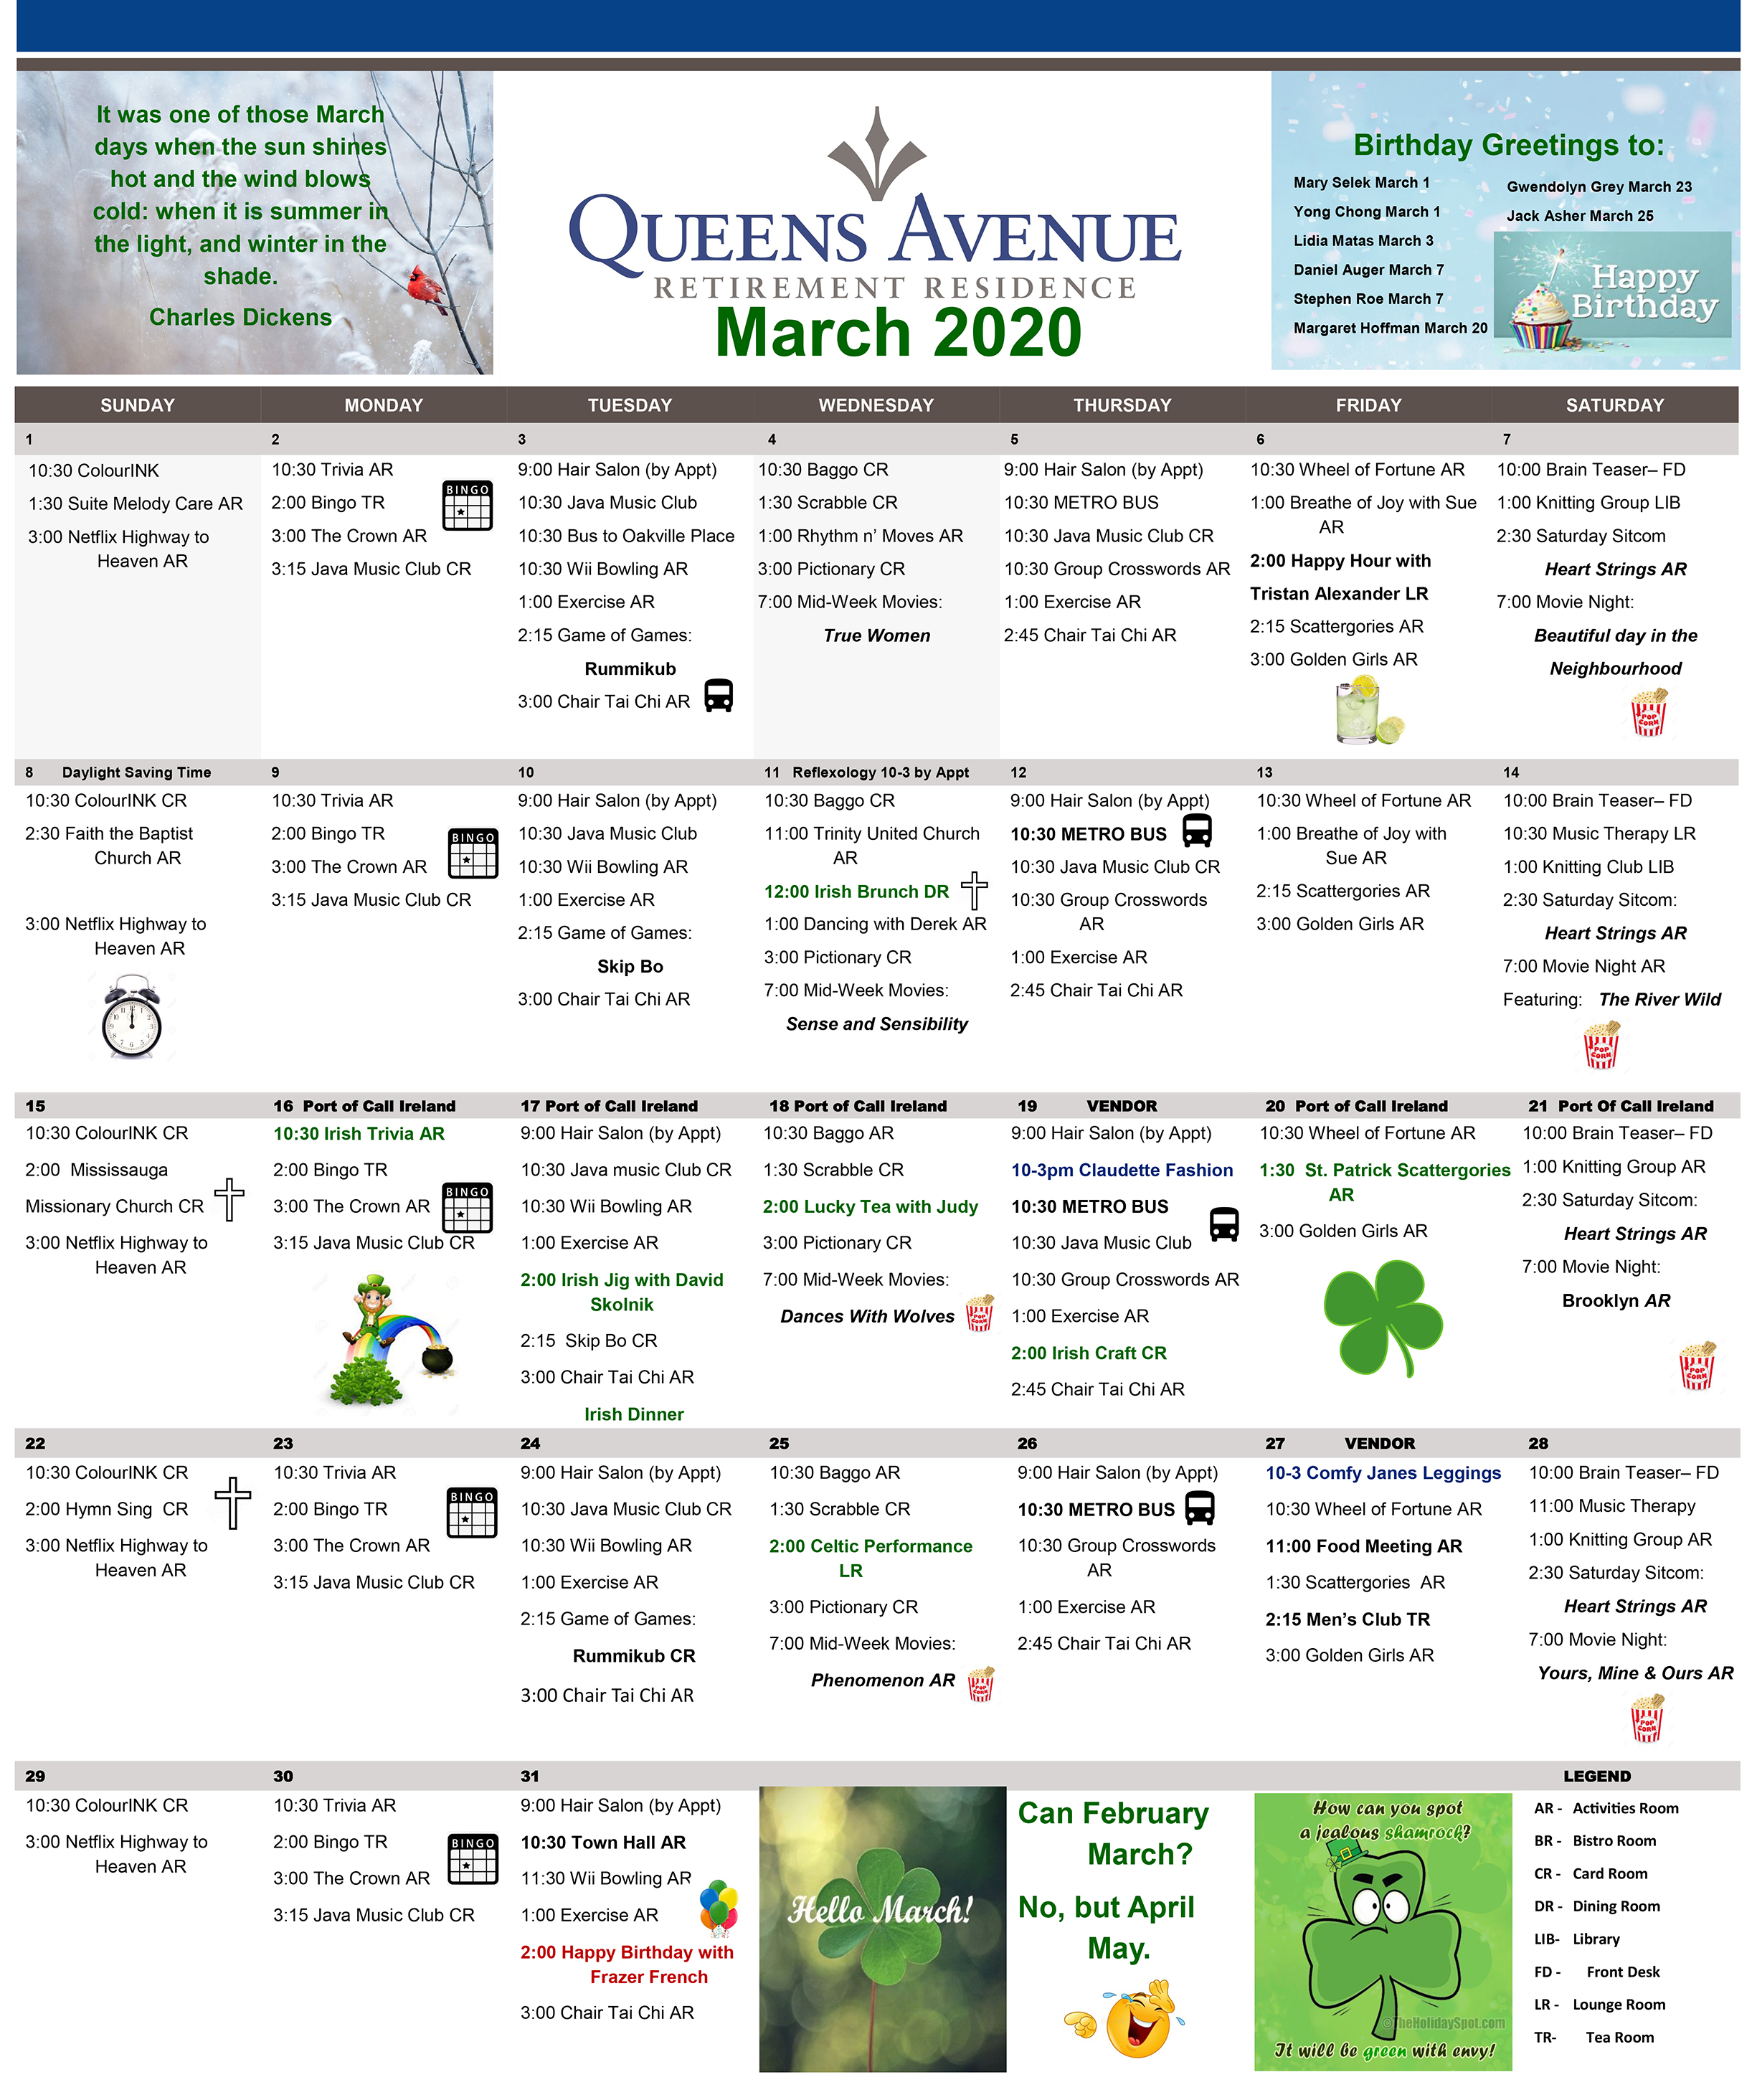 Queens Avenue Retirement Residence Calendar 2020